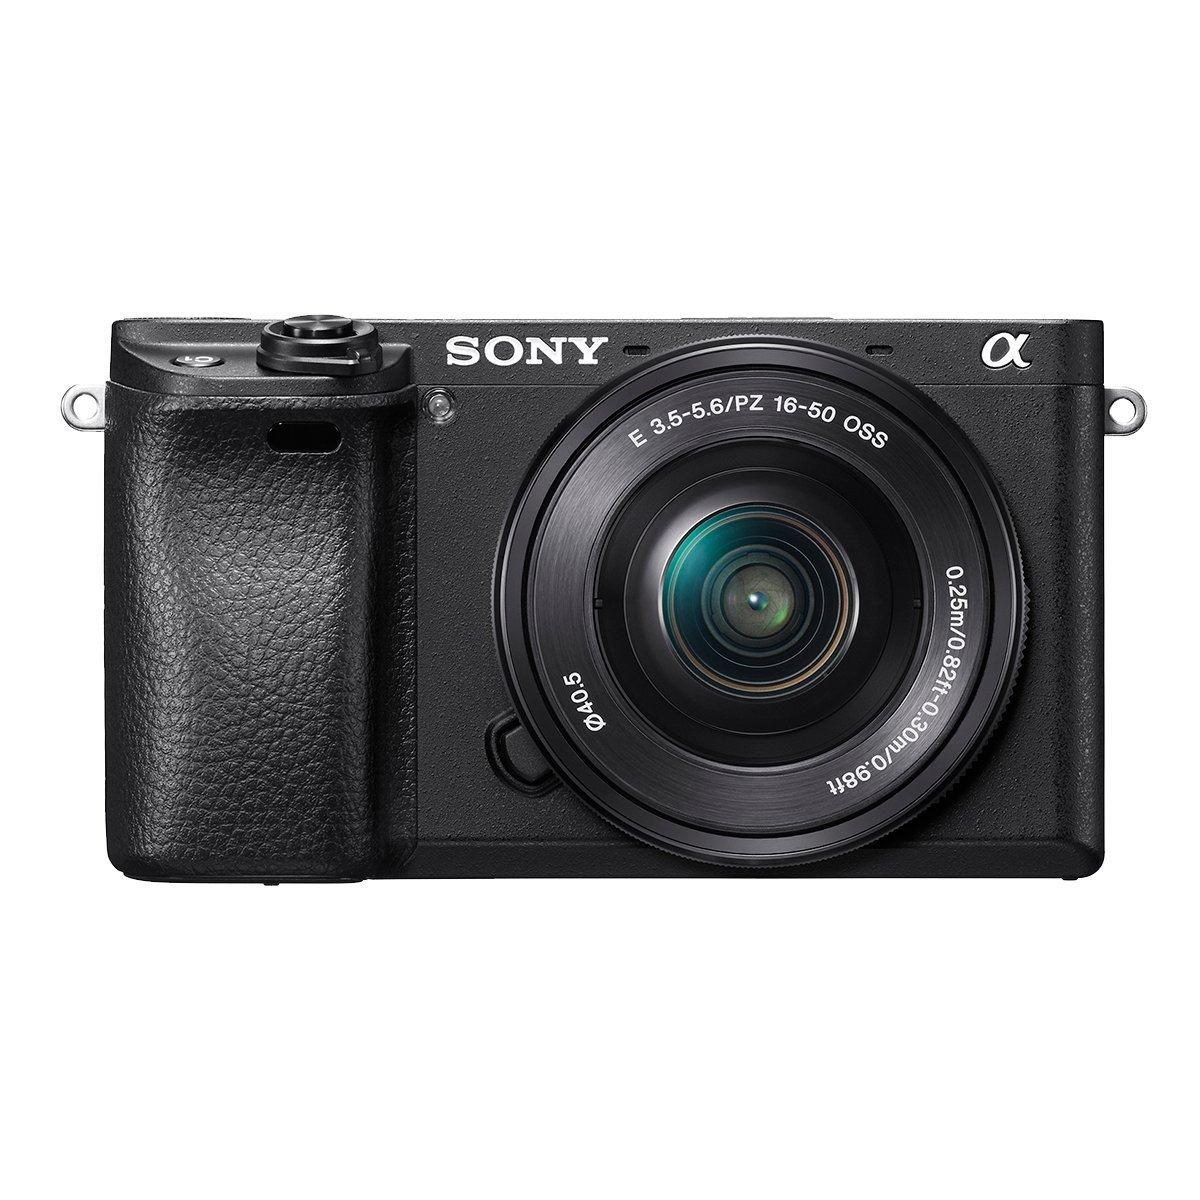 Sony A6300 KIT 16-50mm Objektiv 1153,17 Euro statt 1.359 Euro